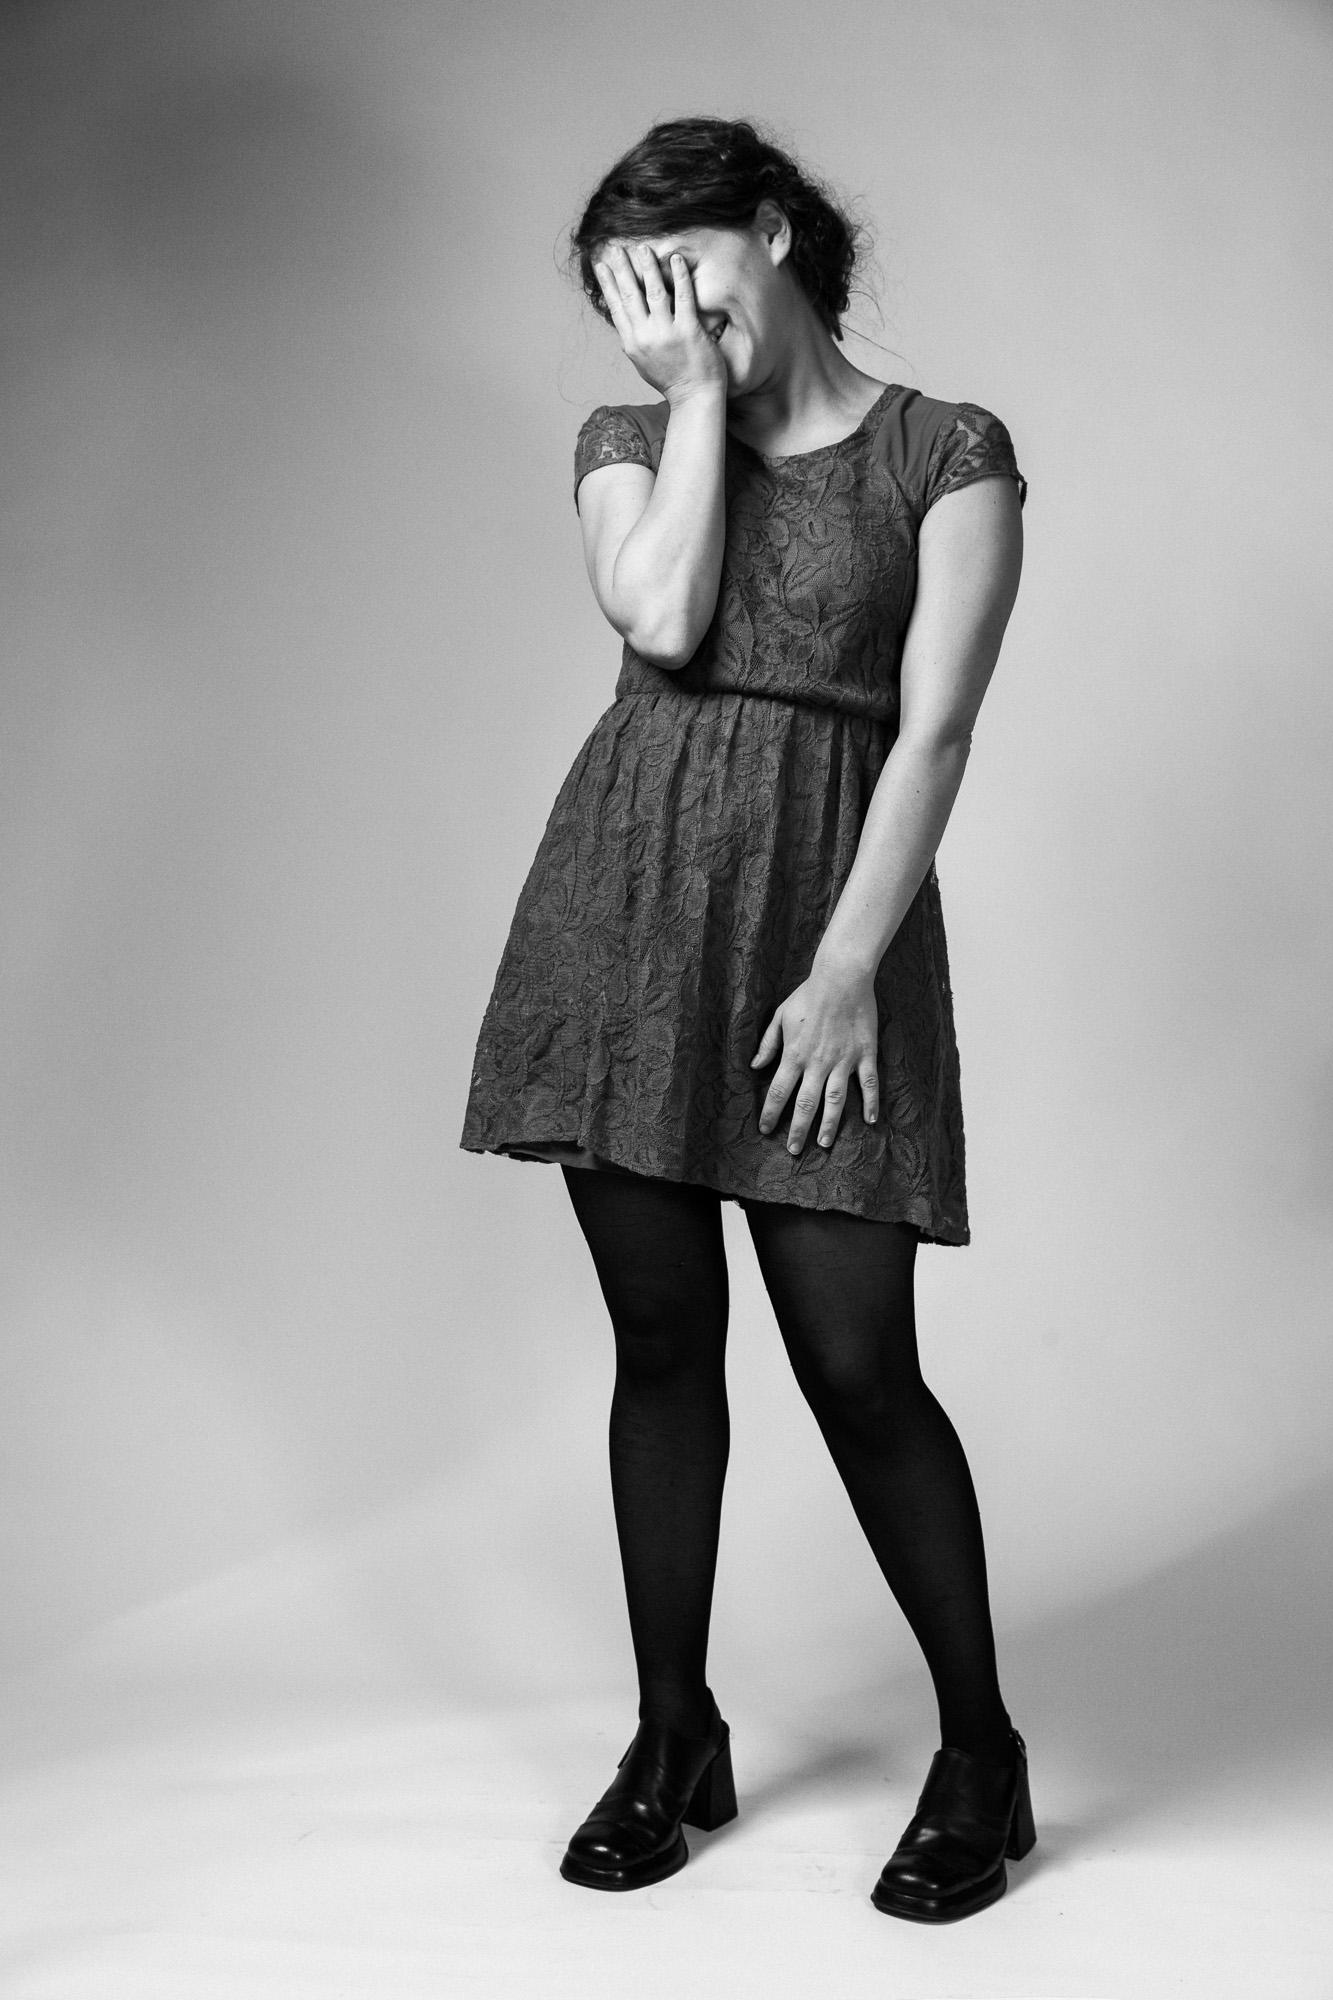 iso800-commerciëel fotograaf-headshots-stefanie-portfolio-portret